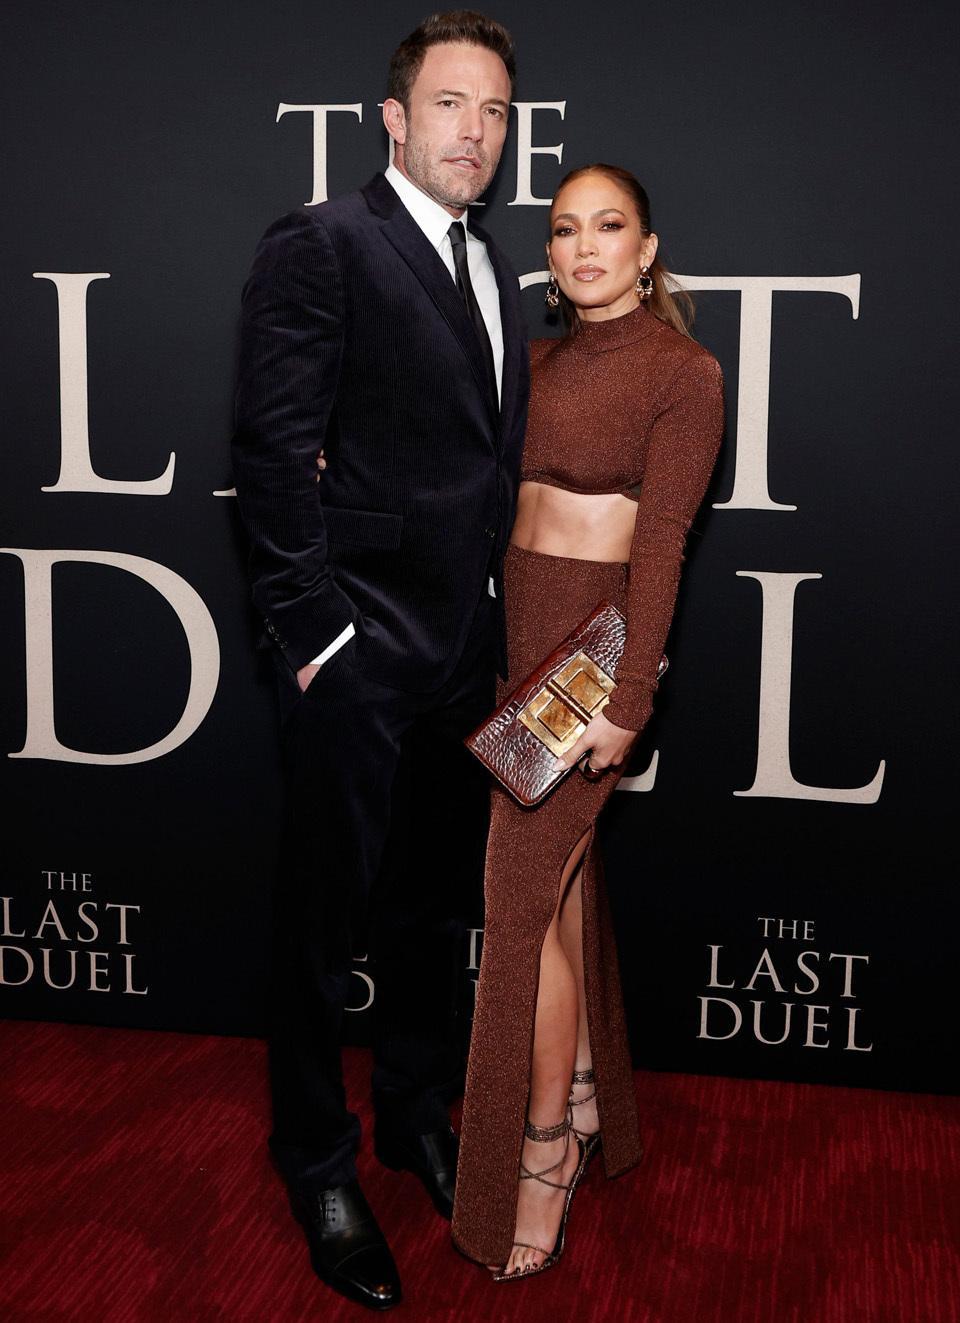 El vestido brillante Herve Leger de Jennifer Lopez, Ben Affleck llegó con un mono de Ralph Lauren para el estreno